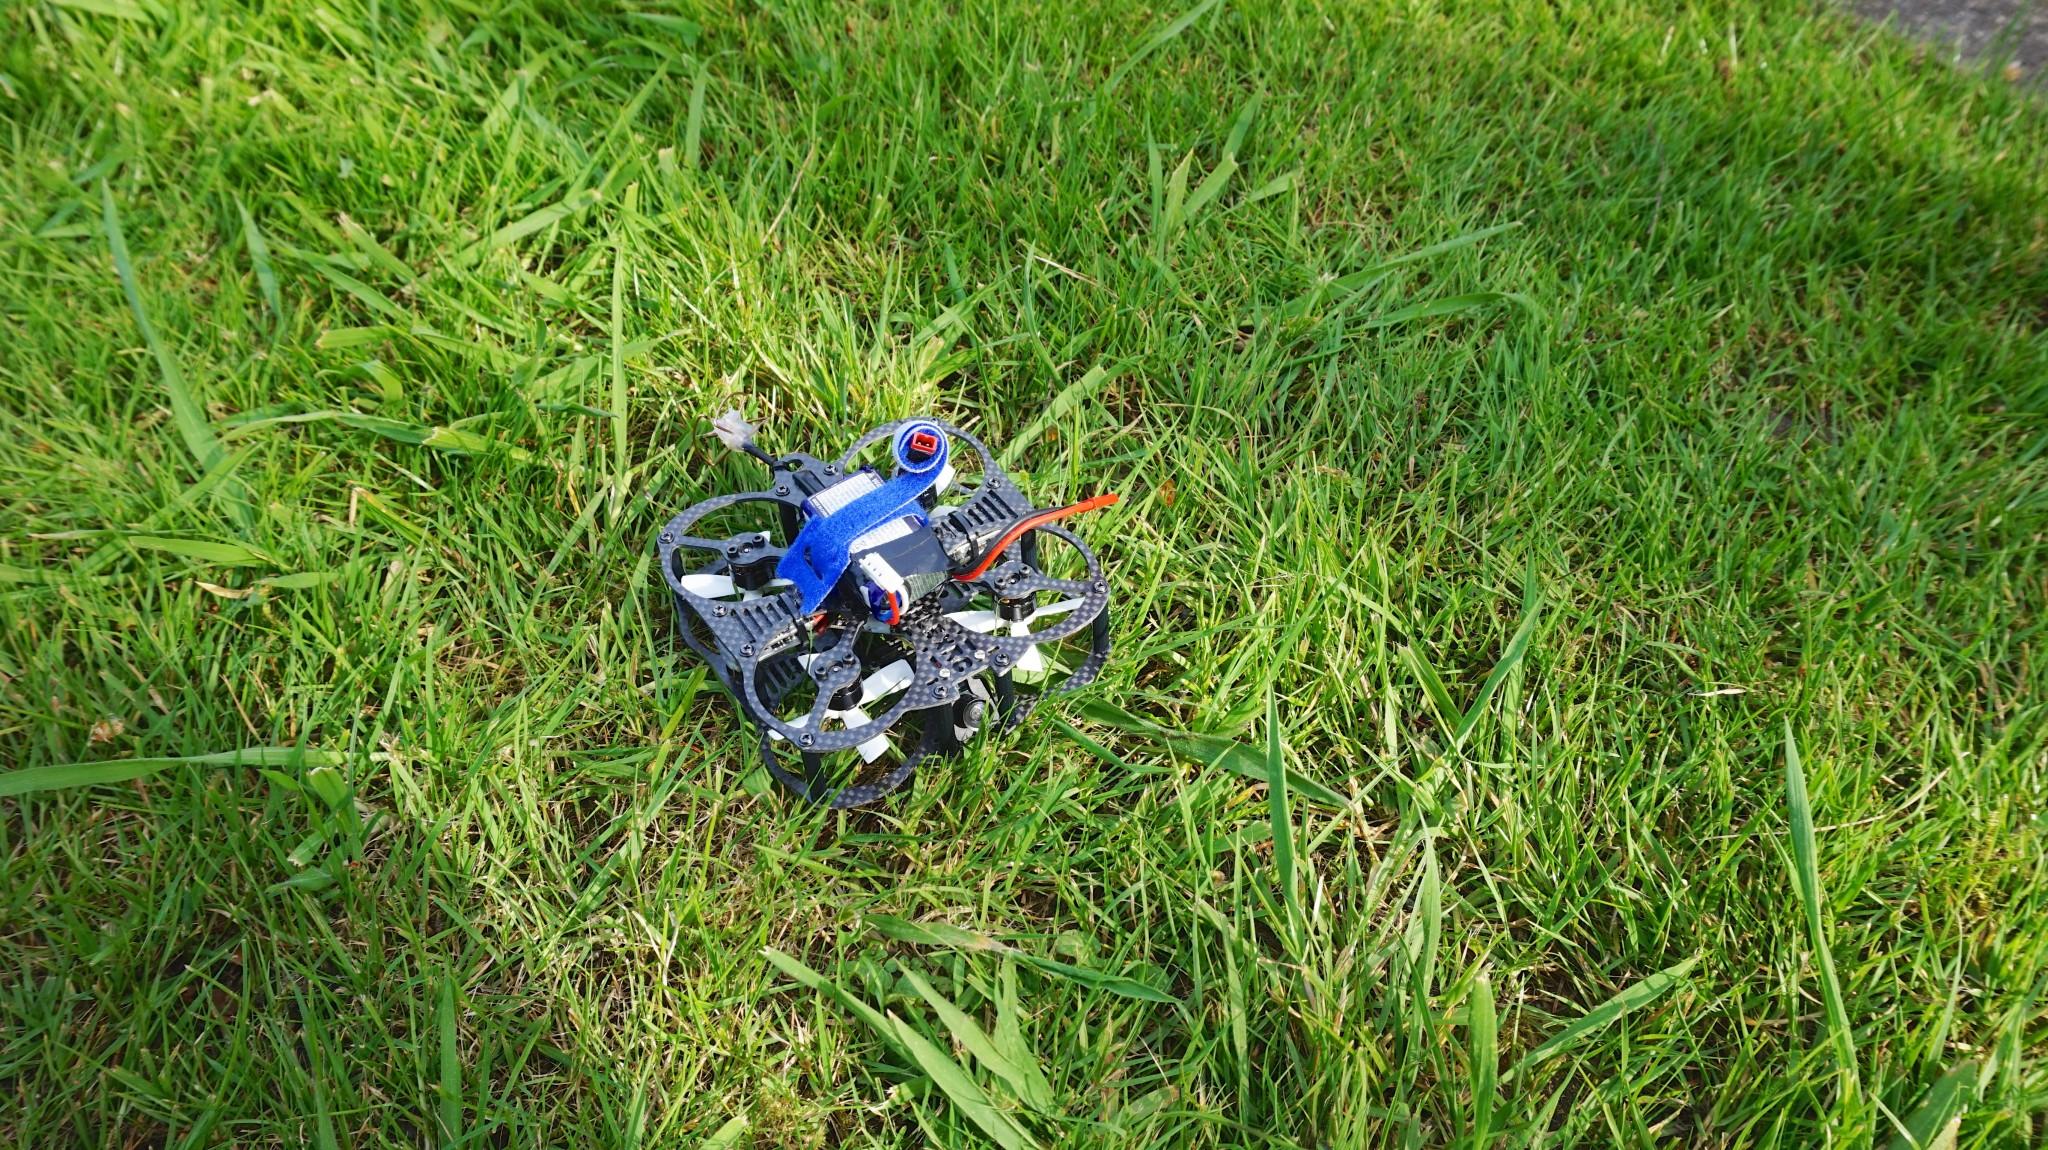 Mini Owl – Smallest Indoor Proximity FPV Racing Drone Frame – Flex RC